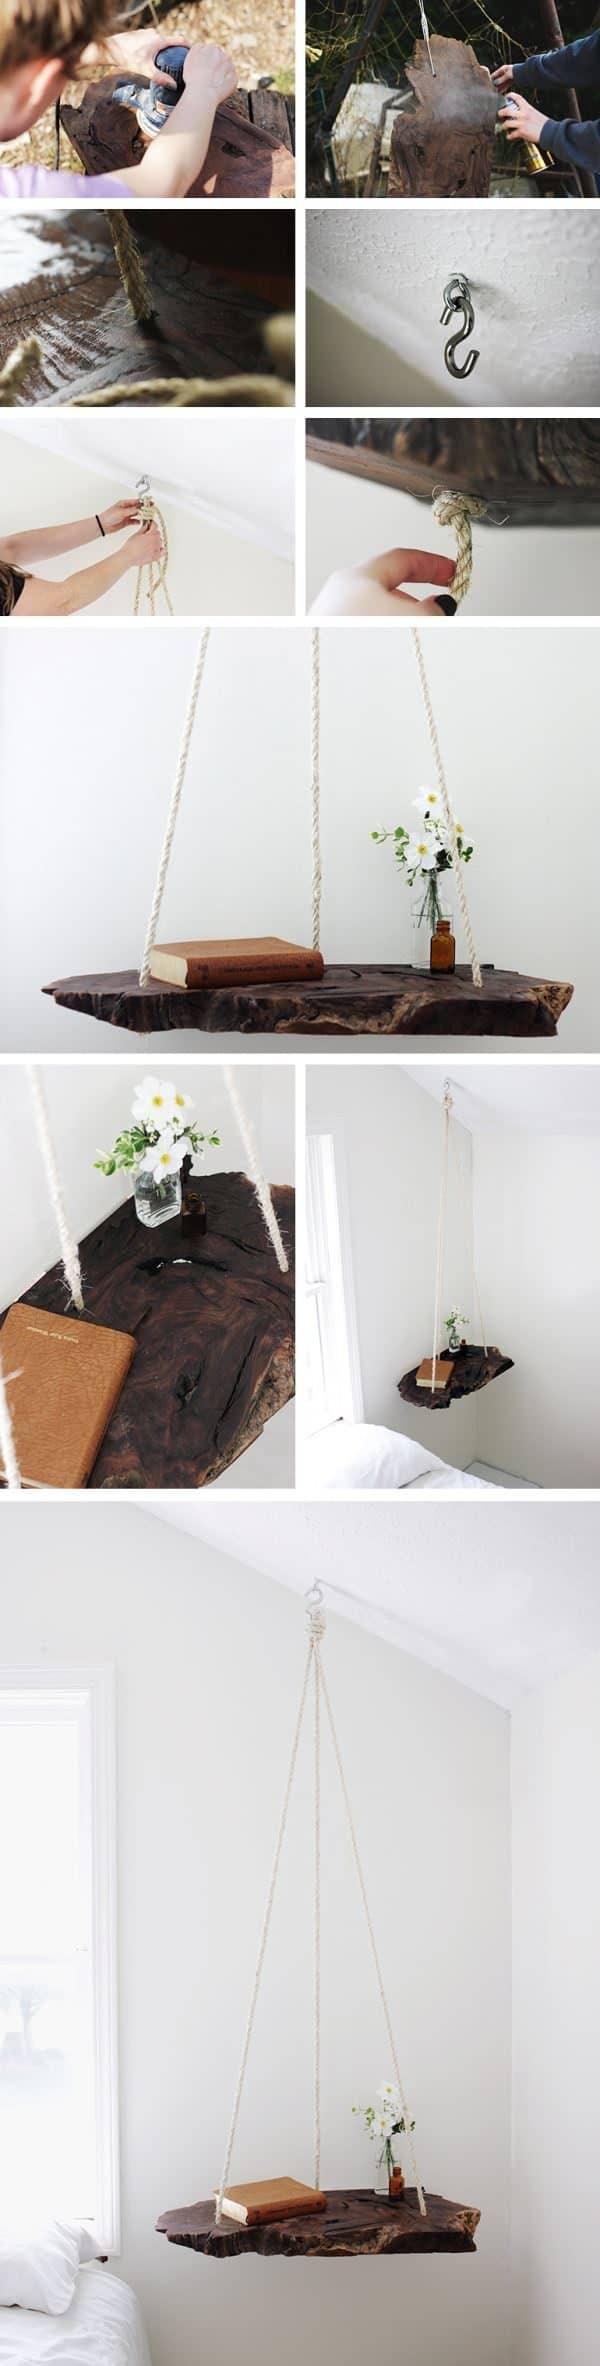 Diy: Wood Log Into Pendant Table Do-It-Yourself Ideas Wood & Organic